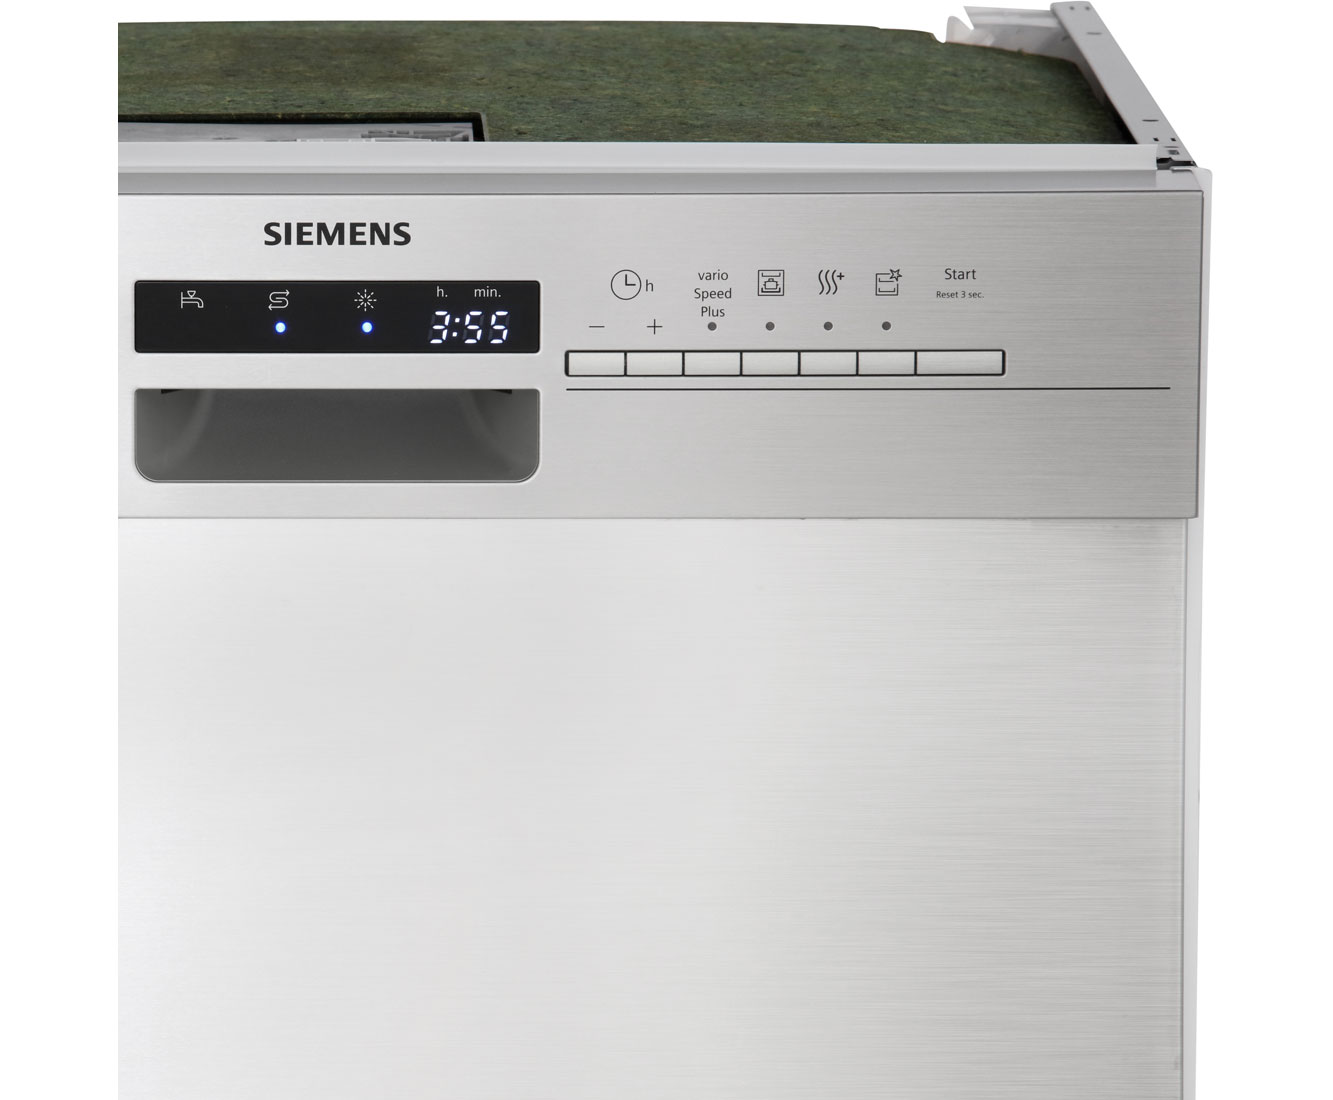 Siemens Unterbau Kühlschrank : Unterbau kühlschrank cm siemens sn s ke iq